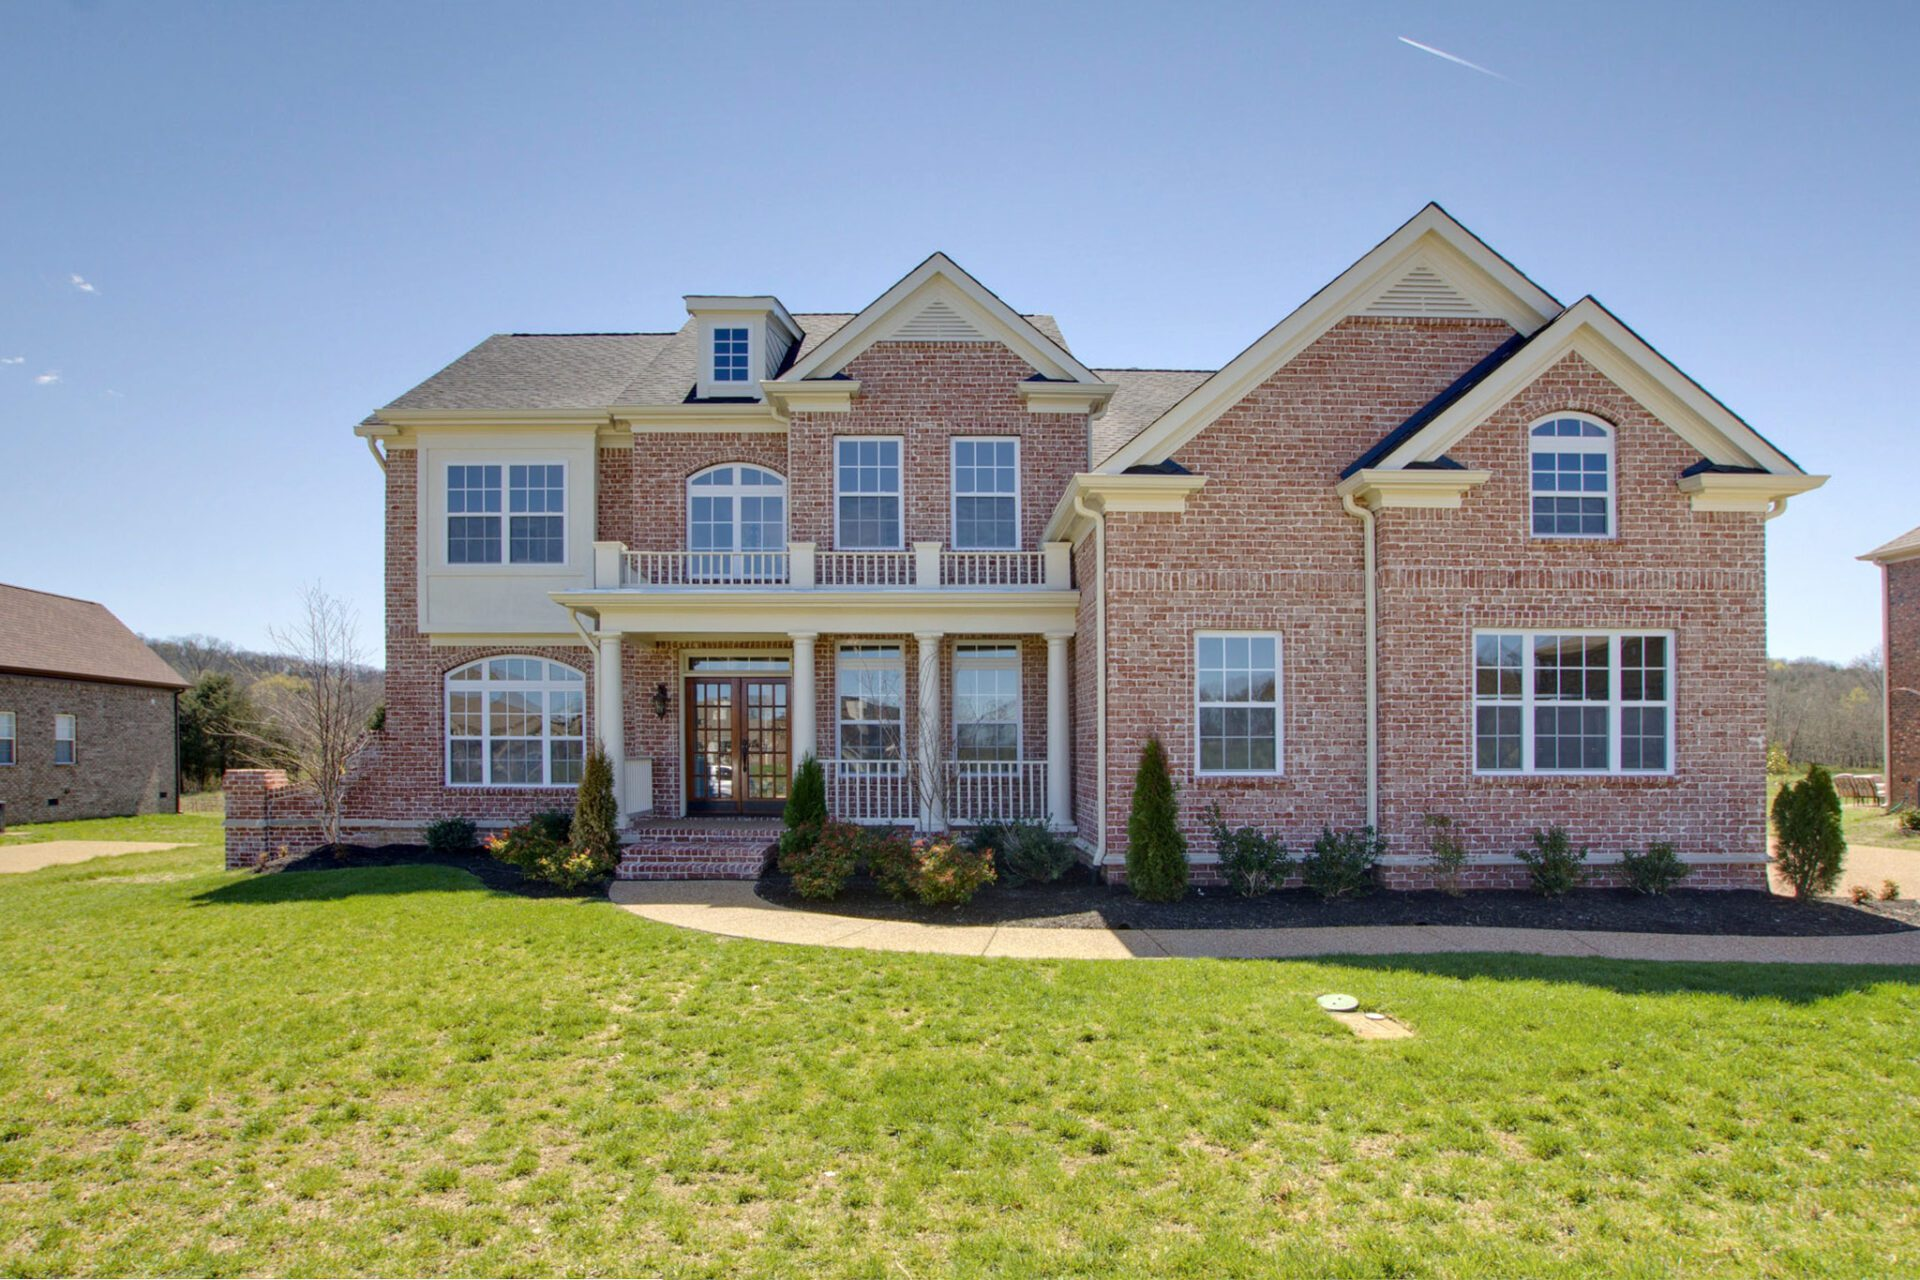 Buckingham - Premier, High-end home builders for luxury homes - luxury home builder | Nashville, TN